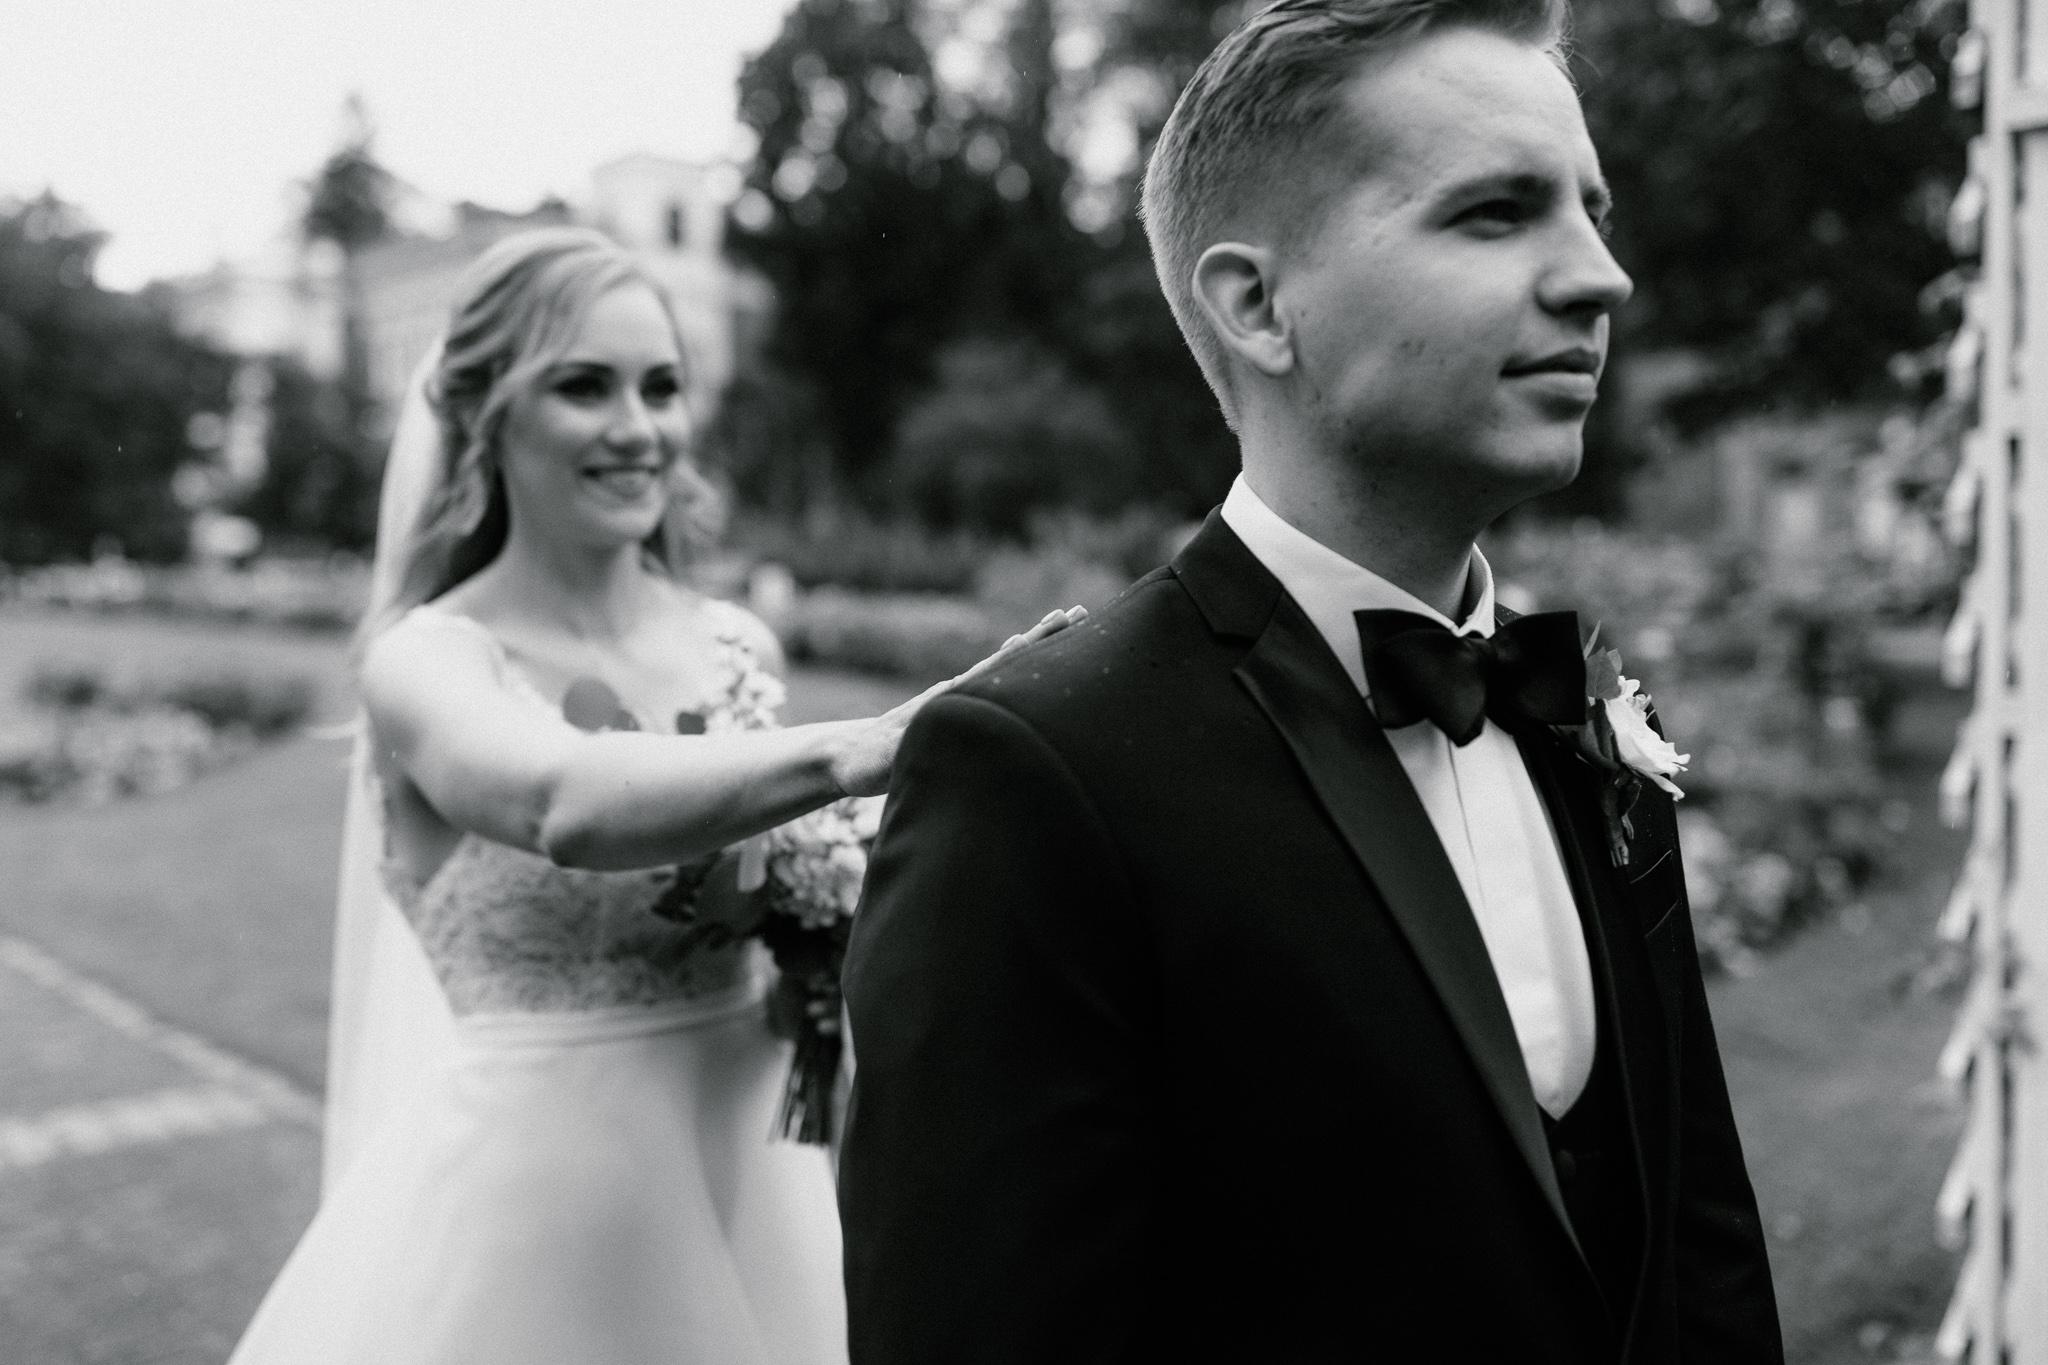 Johanna + Mikko - Tampere - Photo by Patrick Karkkolainen Wedding Photographer-18.jpg